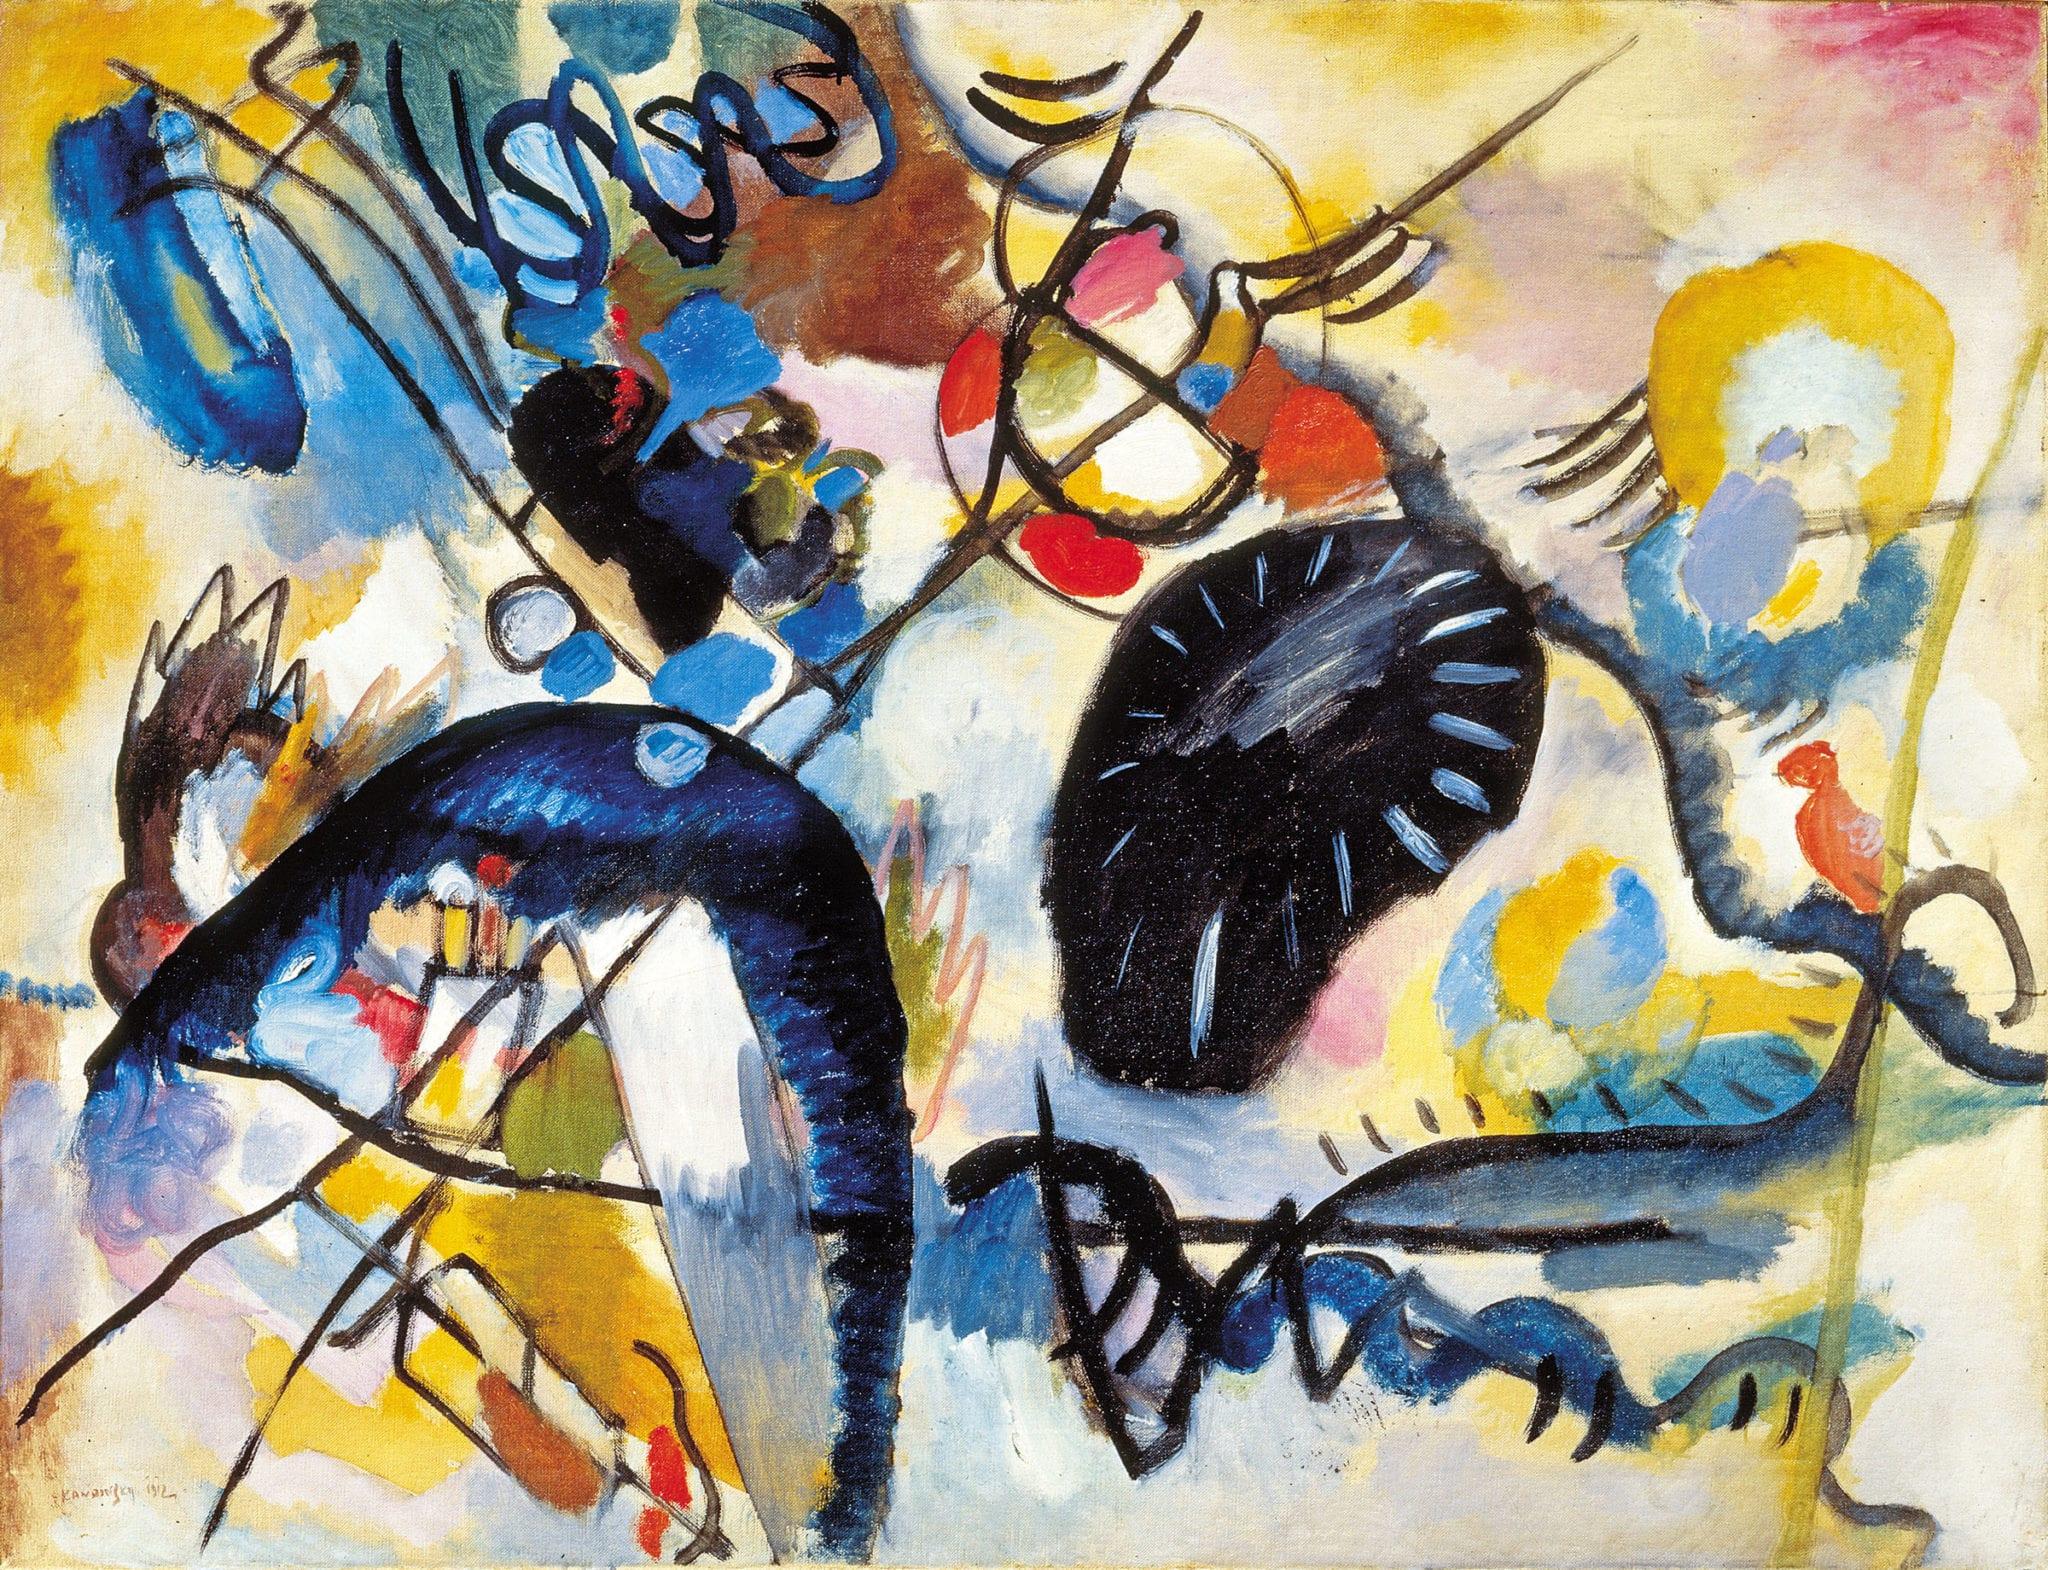 Wassily Kandinsky, Macchia nera I, 1912